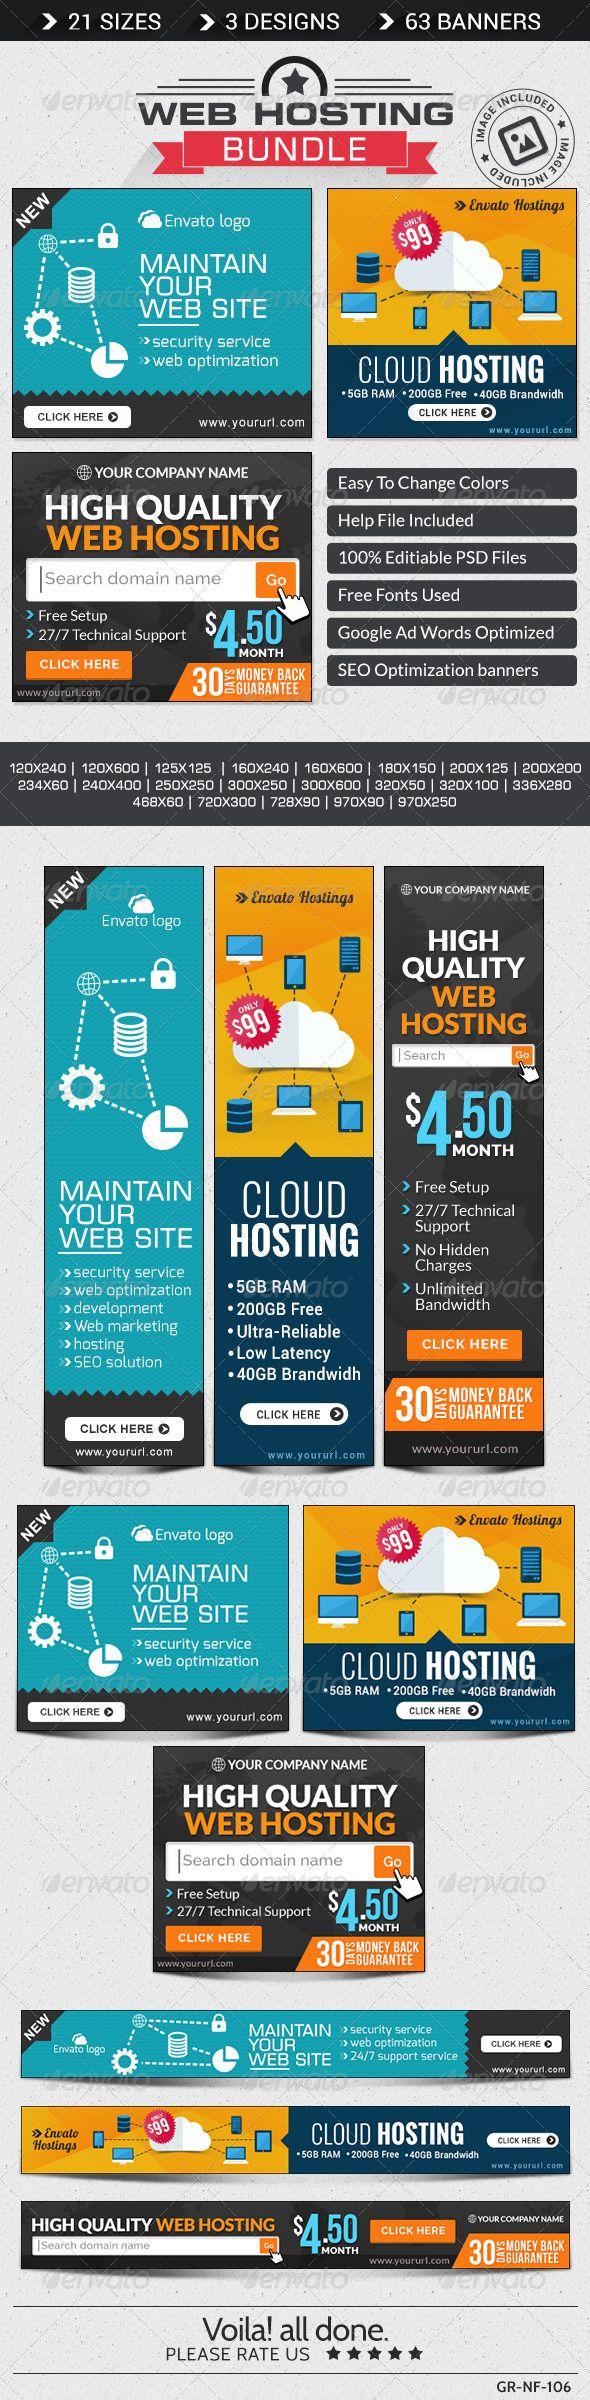 Web Hosting Banner Bundle - 3 Sets Template PSD | #banner #hostingbanner  #templatepsd | Buy and Download: http://graphicriver.net/item/web-hosting-banner-bundle-3-sets/8561402?WT.ac=category_thumb&WT.z_author=doto&ref=ksioks